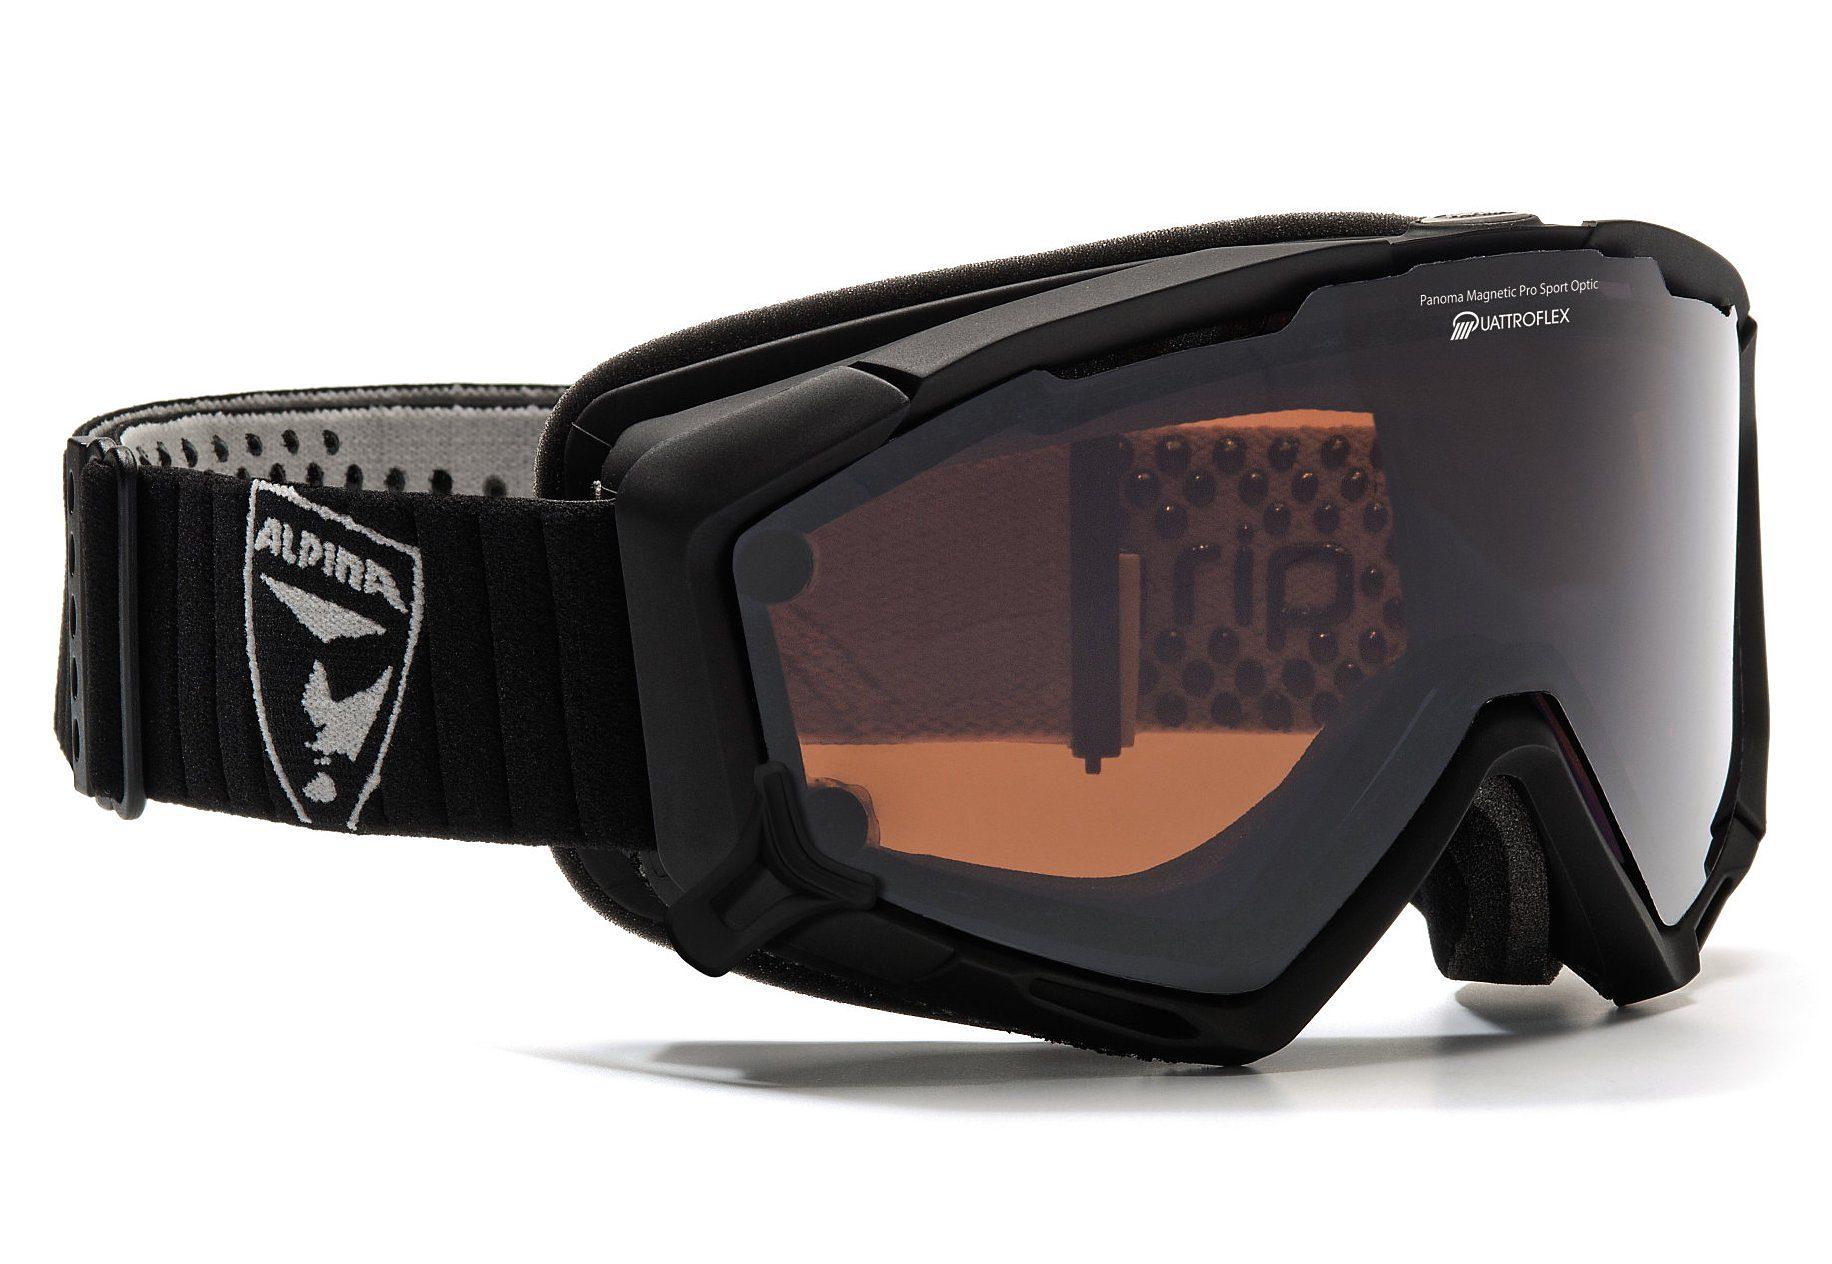 Skibrille, schwarz matt, Alpina, »Panoma Magnetic«, Made in Germany